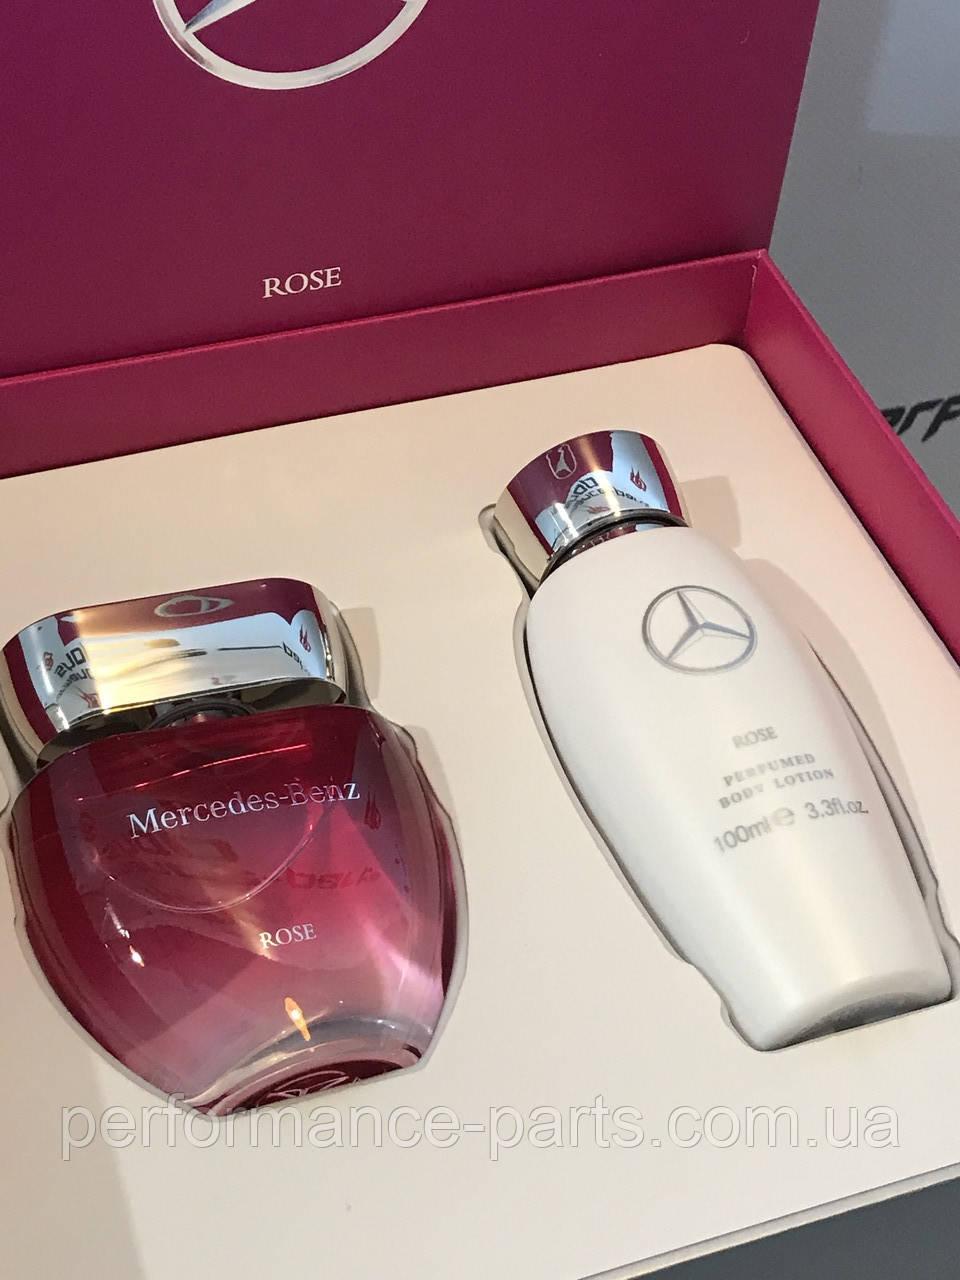 Женский подарочный парфюмерный набор Mercedes-Benz Ladies Rose Perfume, Set of 2, 50 ml, артикул B66954759